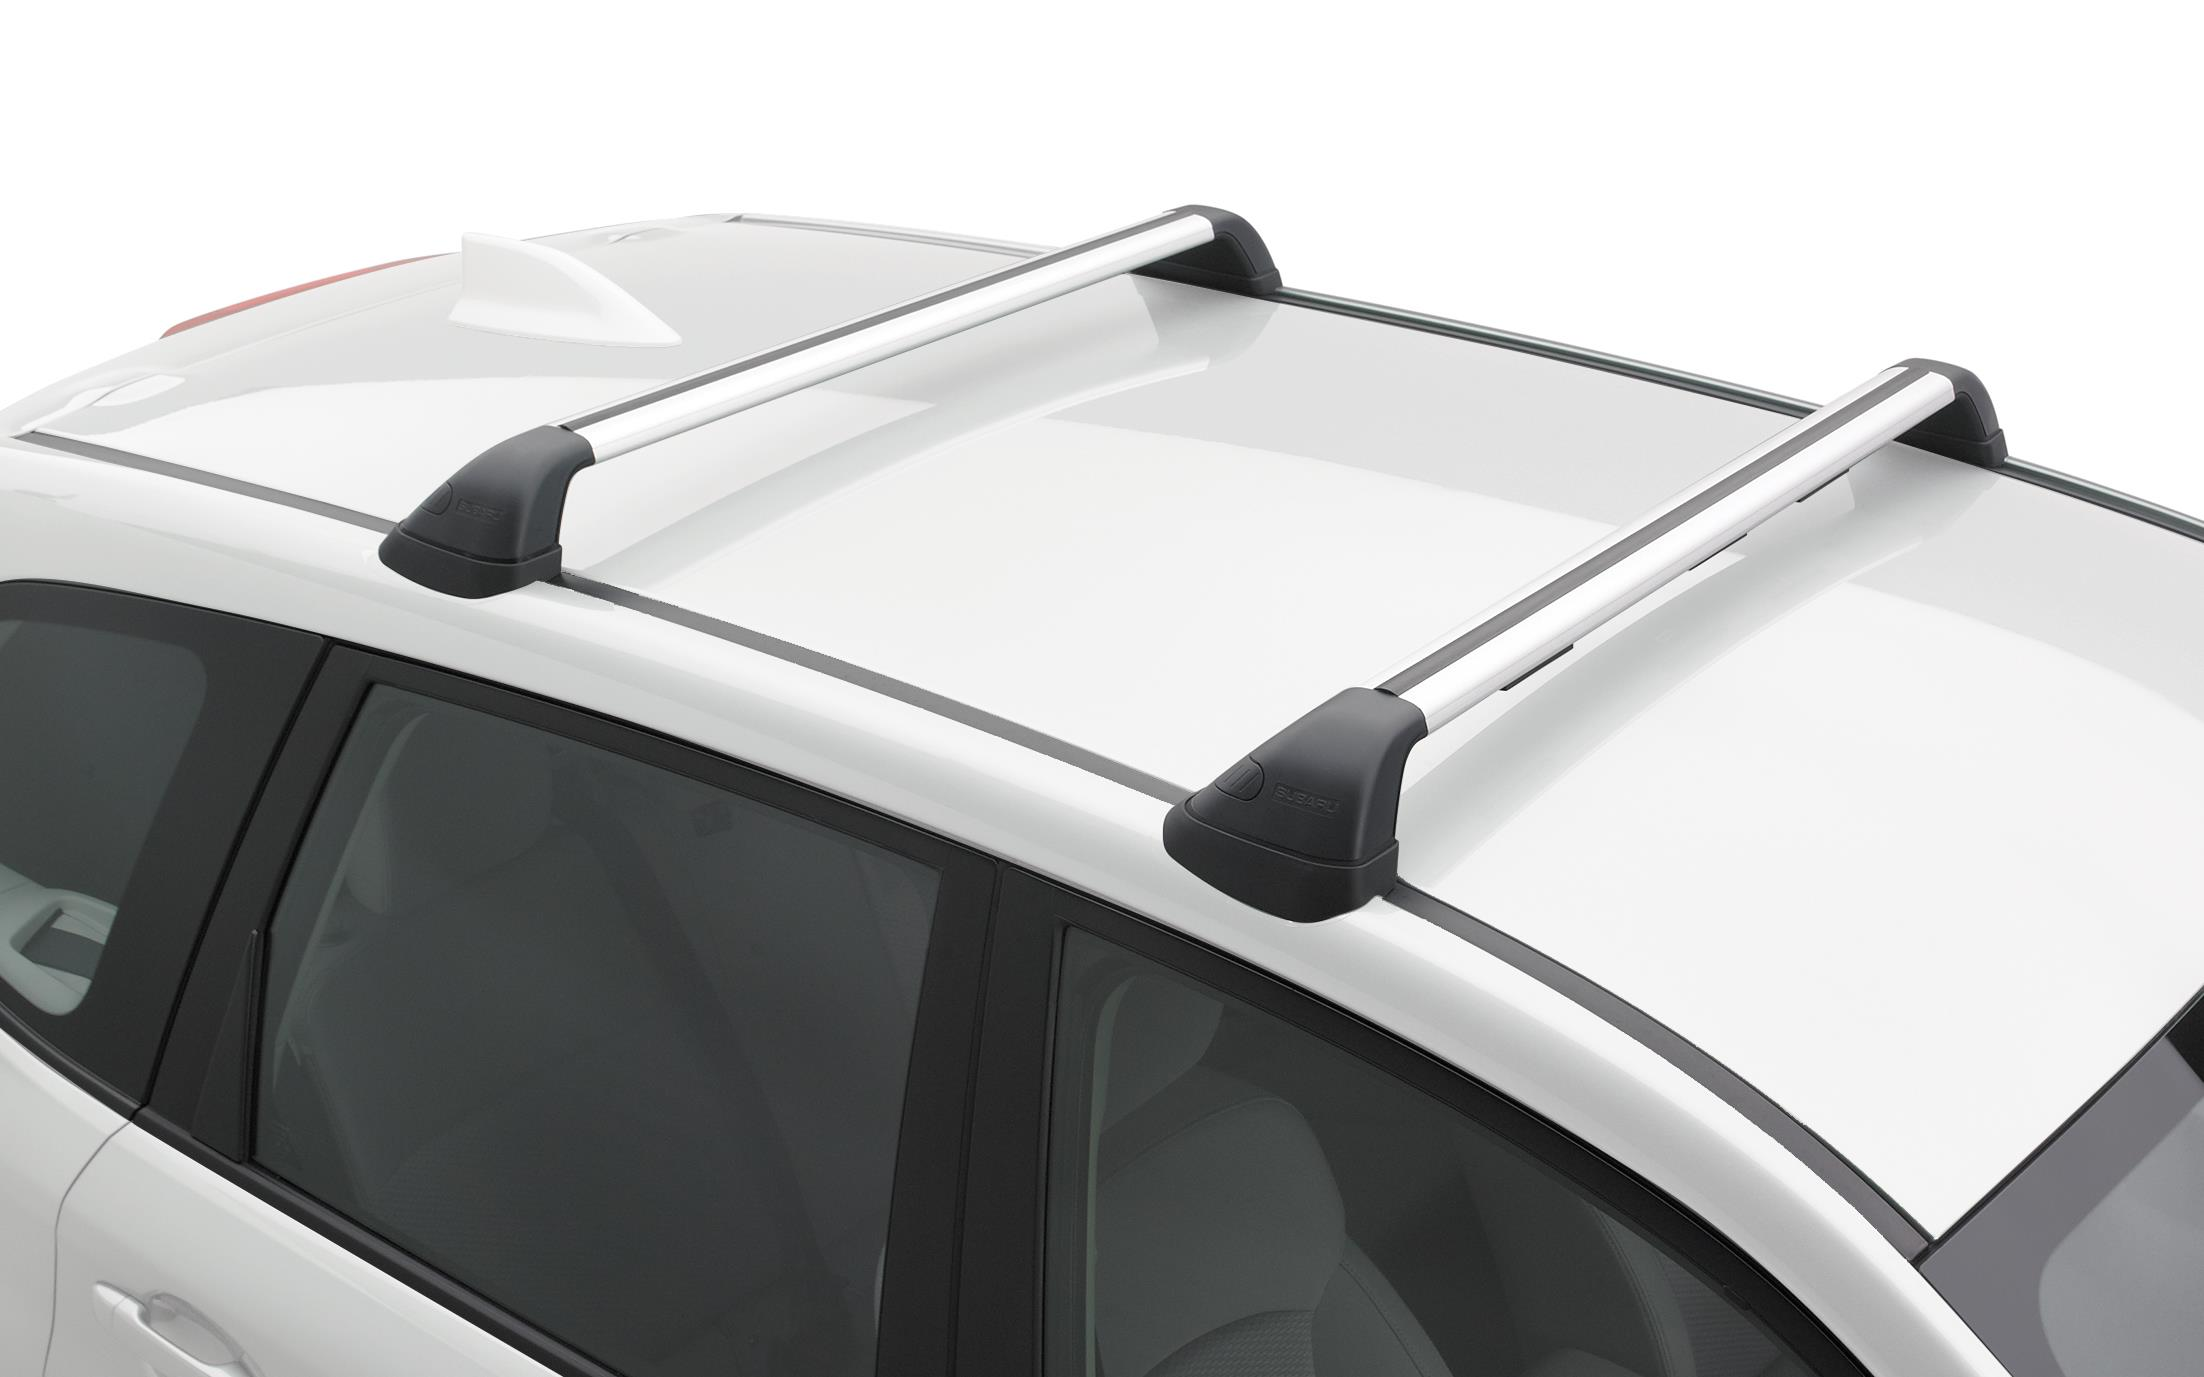 2017 Subaru Forester Cross Bar Set Fixed Carrier Base